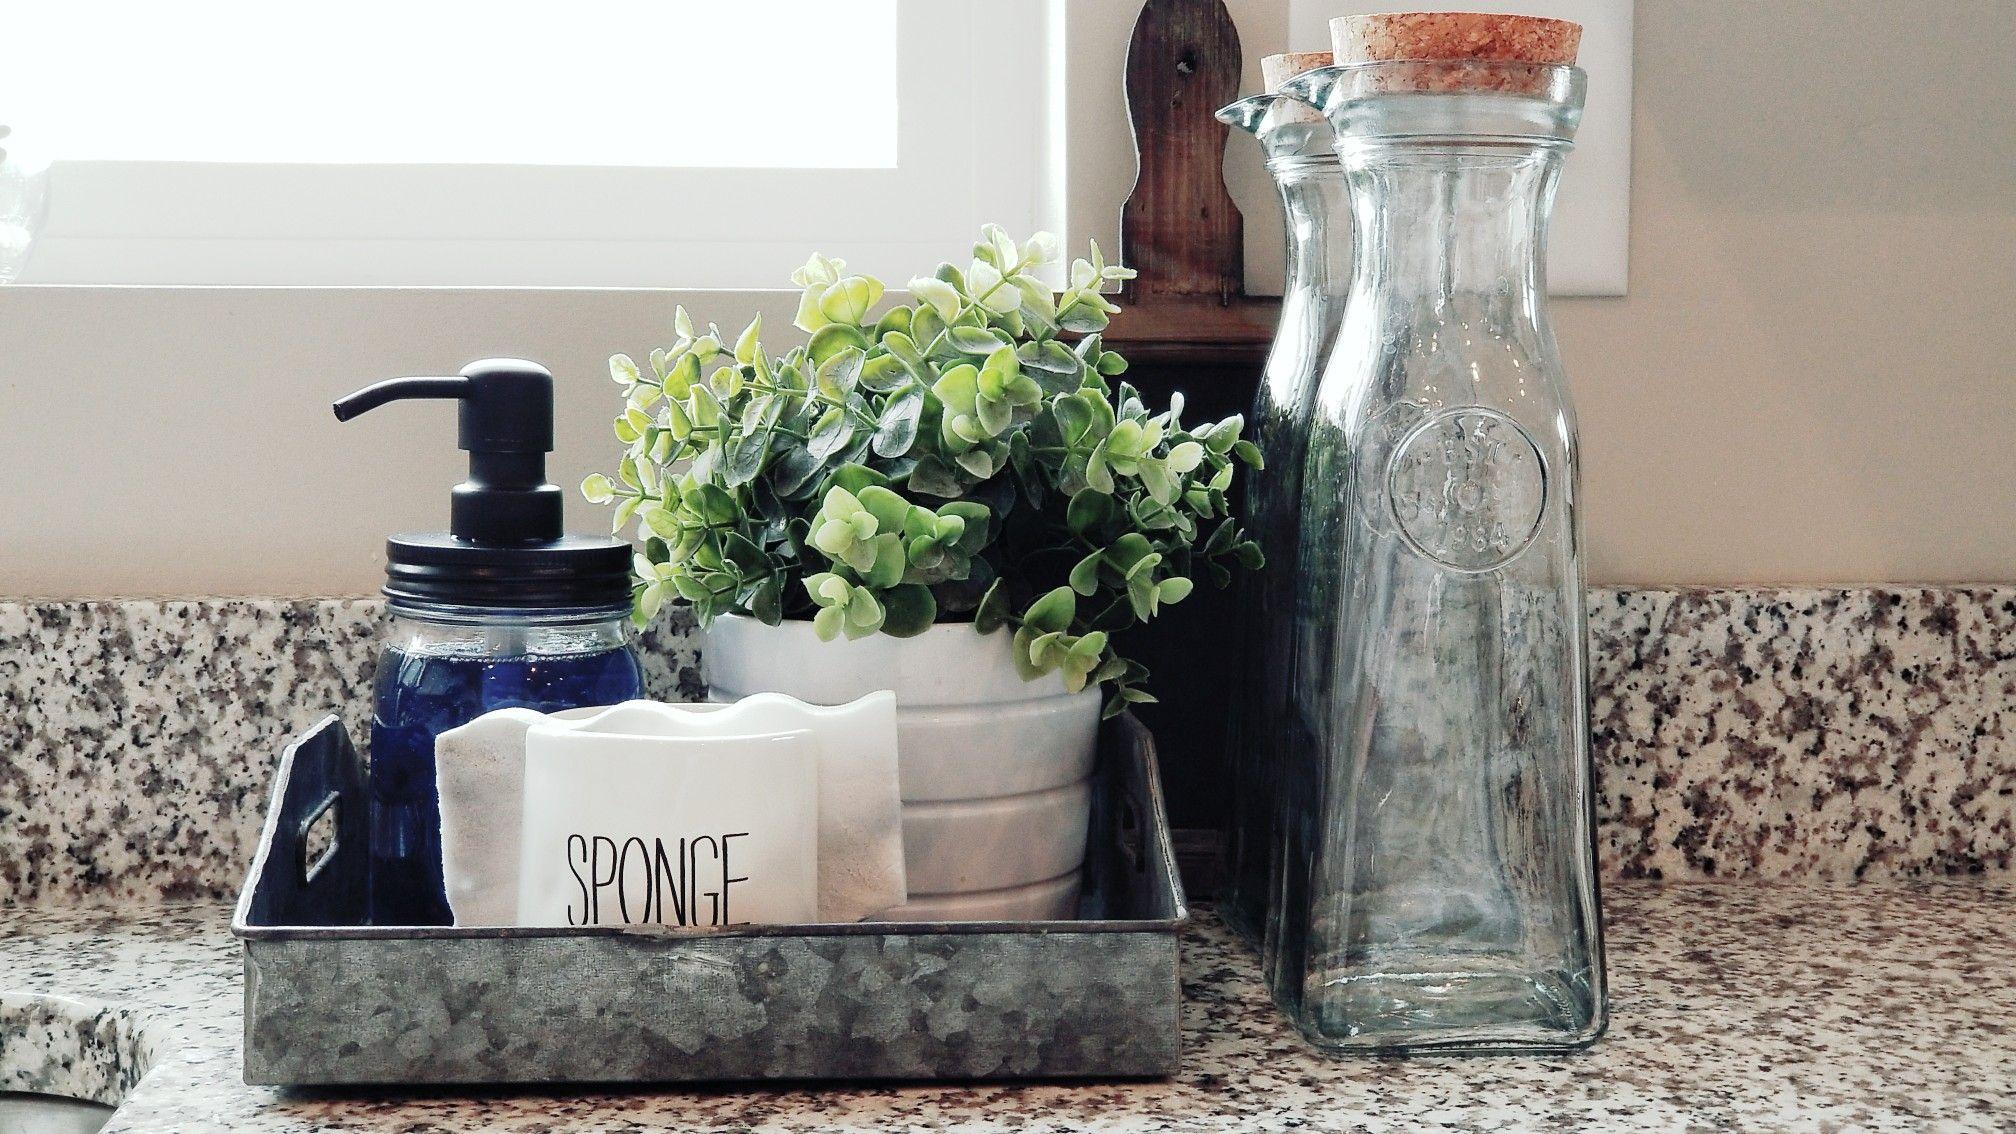 Sink Caddy, Jarmazing Soap Dispenser, Ikea Plant, Sponge